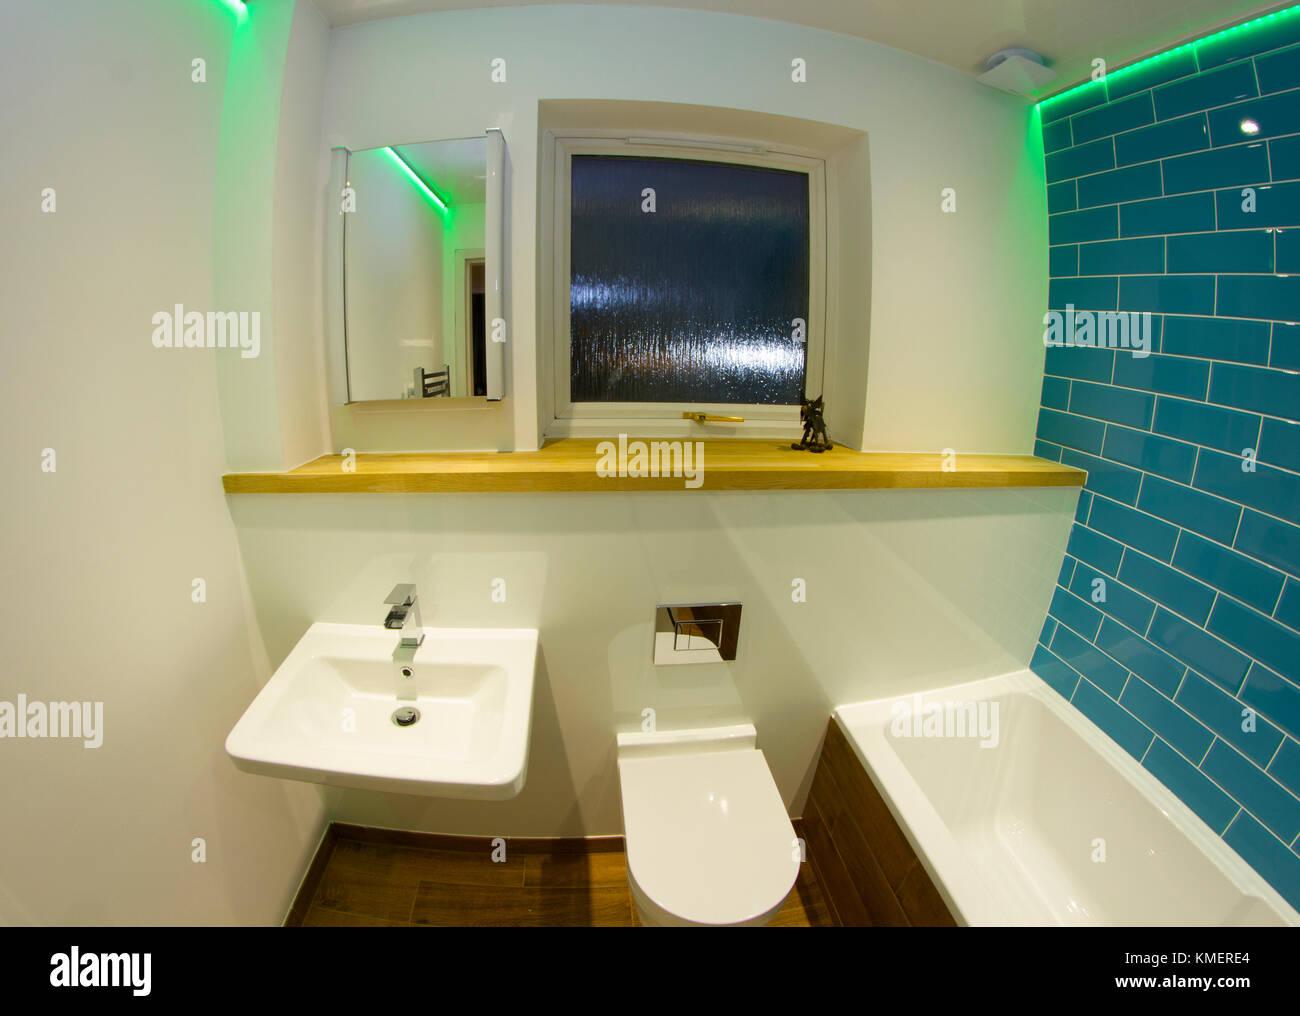 Designer Badezimmer Stockfoto, Bild: 167512188 - Alamy